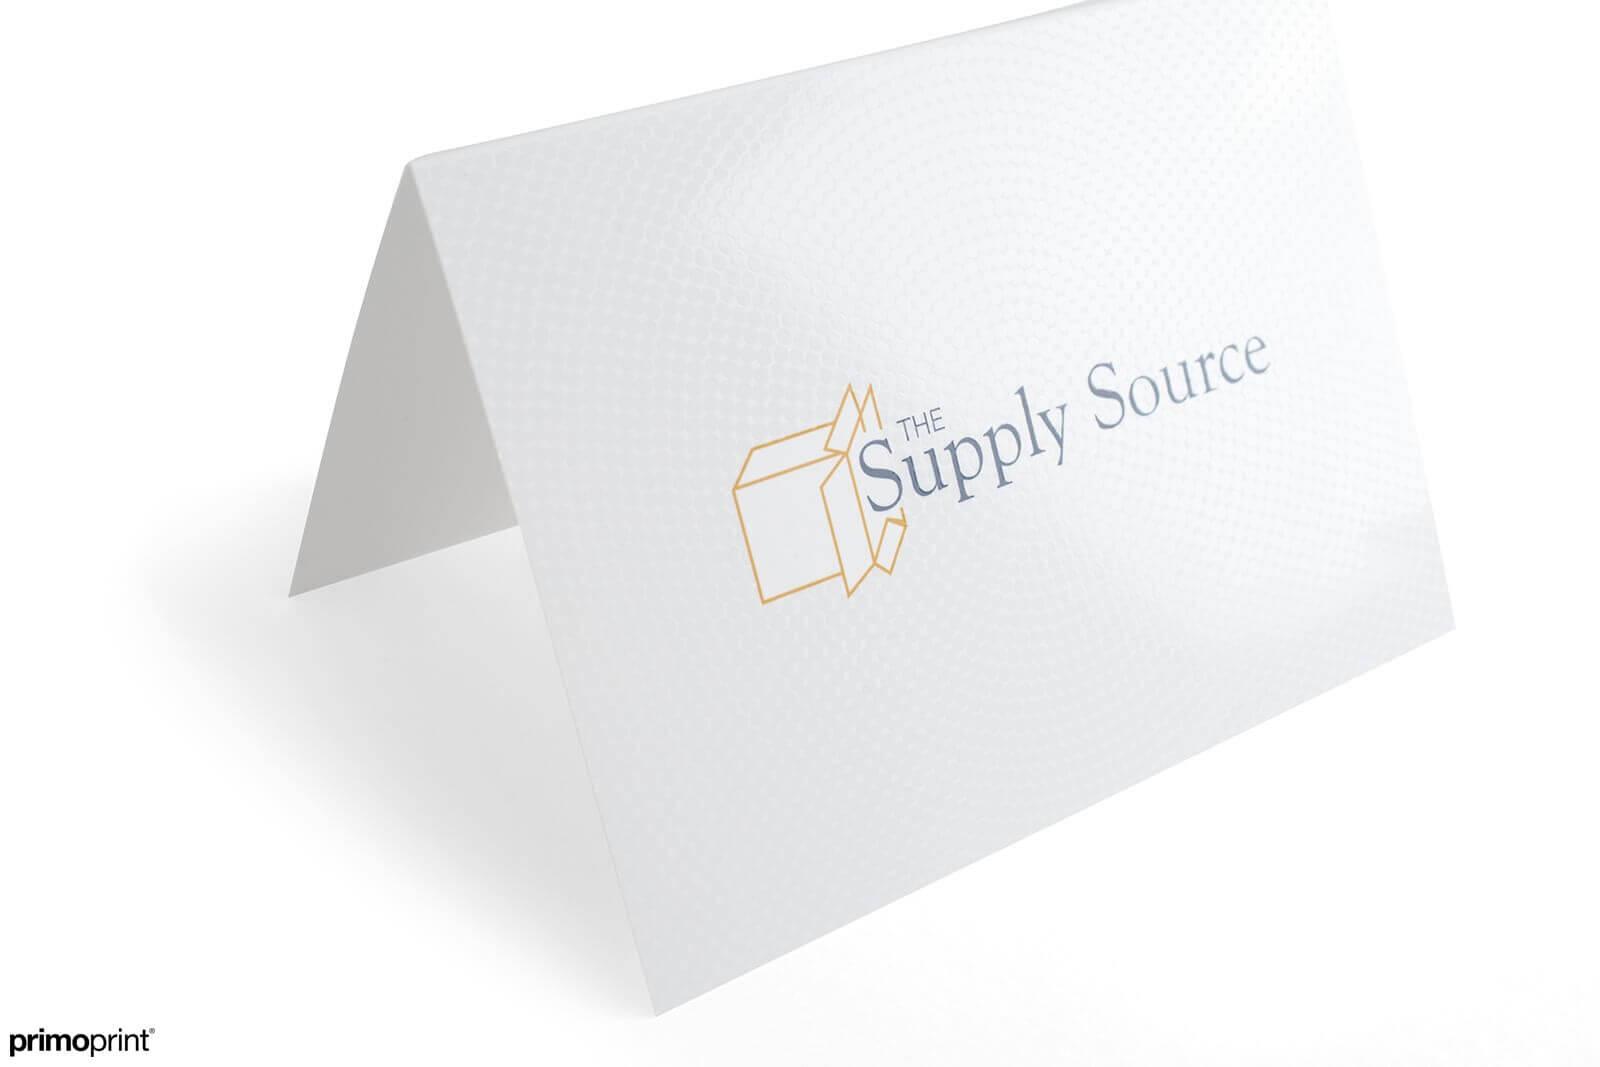 16PT Silk Spot UV Greeting Card Printed by Primoprint